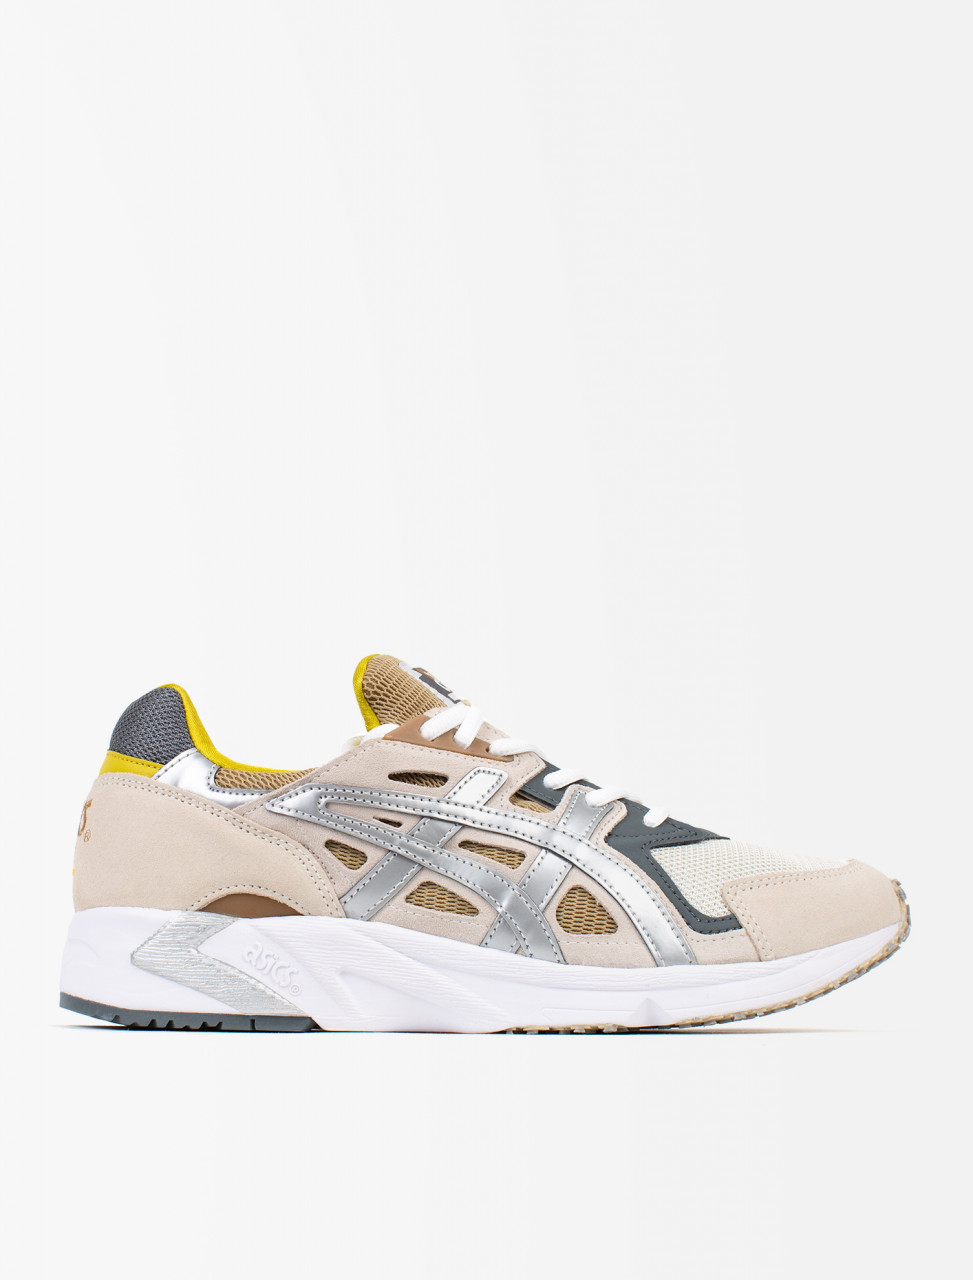 d0c924b5f3 Asics Tiger GEL-DS Trainer OG Sneaker | Voo Store Berlin | Worldwide ...